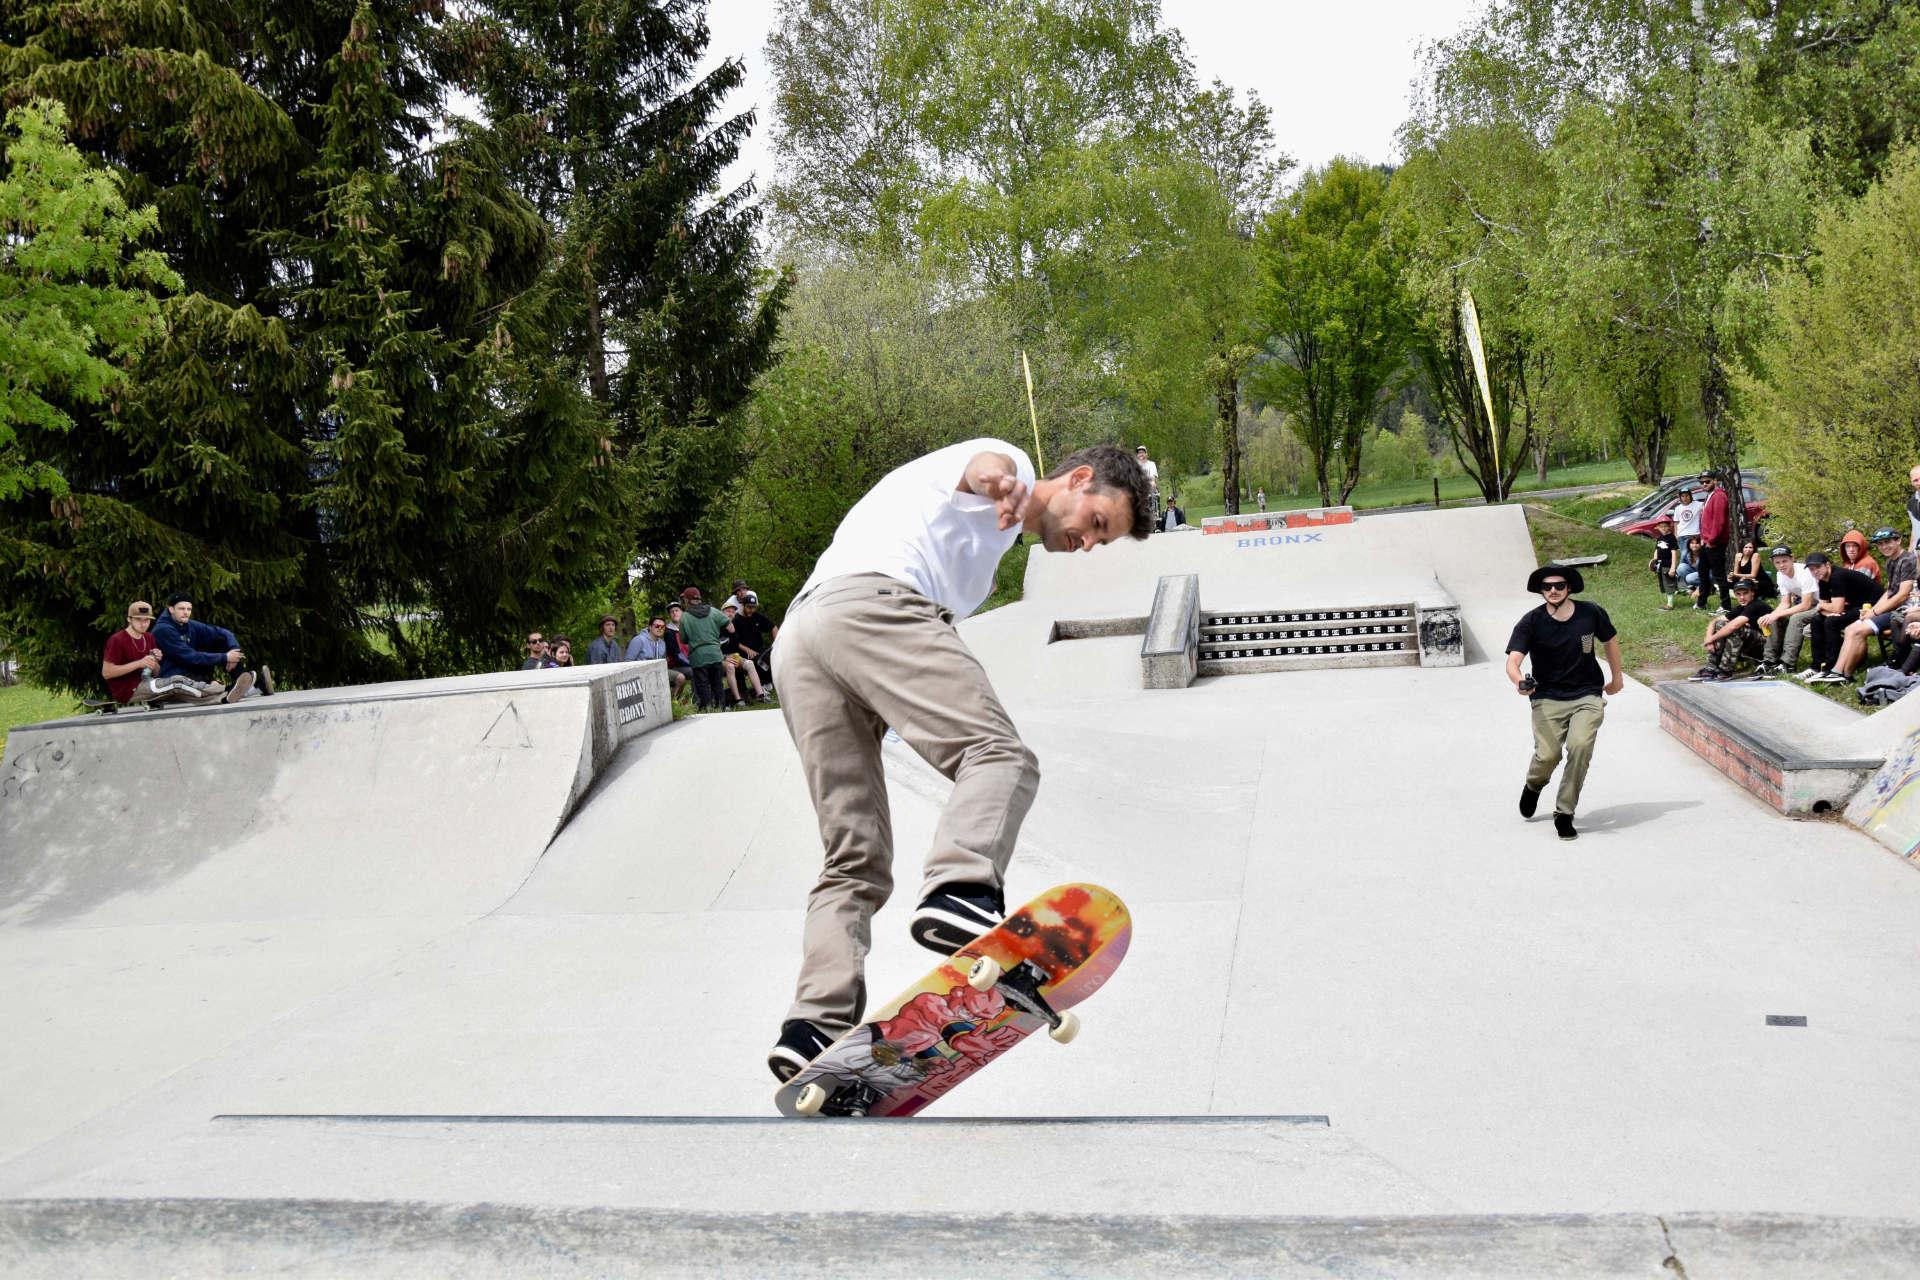 skateboard headz fieberbrunn kgt kitz gau trophy 2019 saalfelden00015